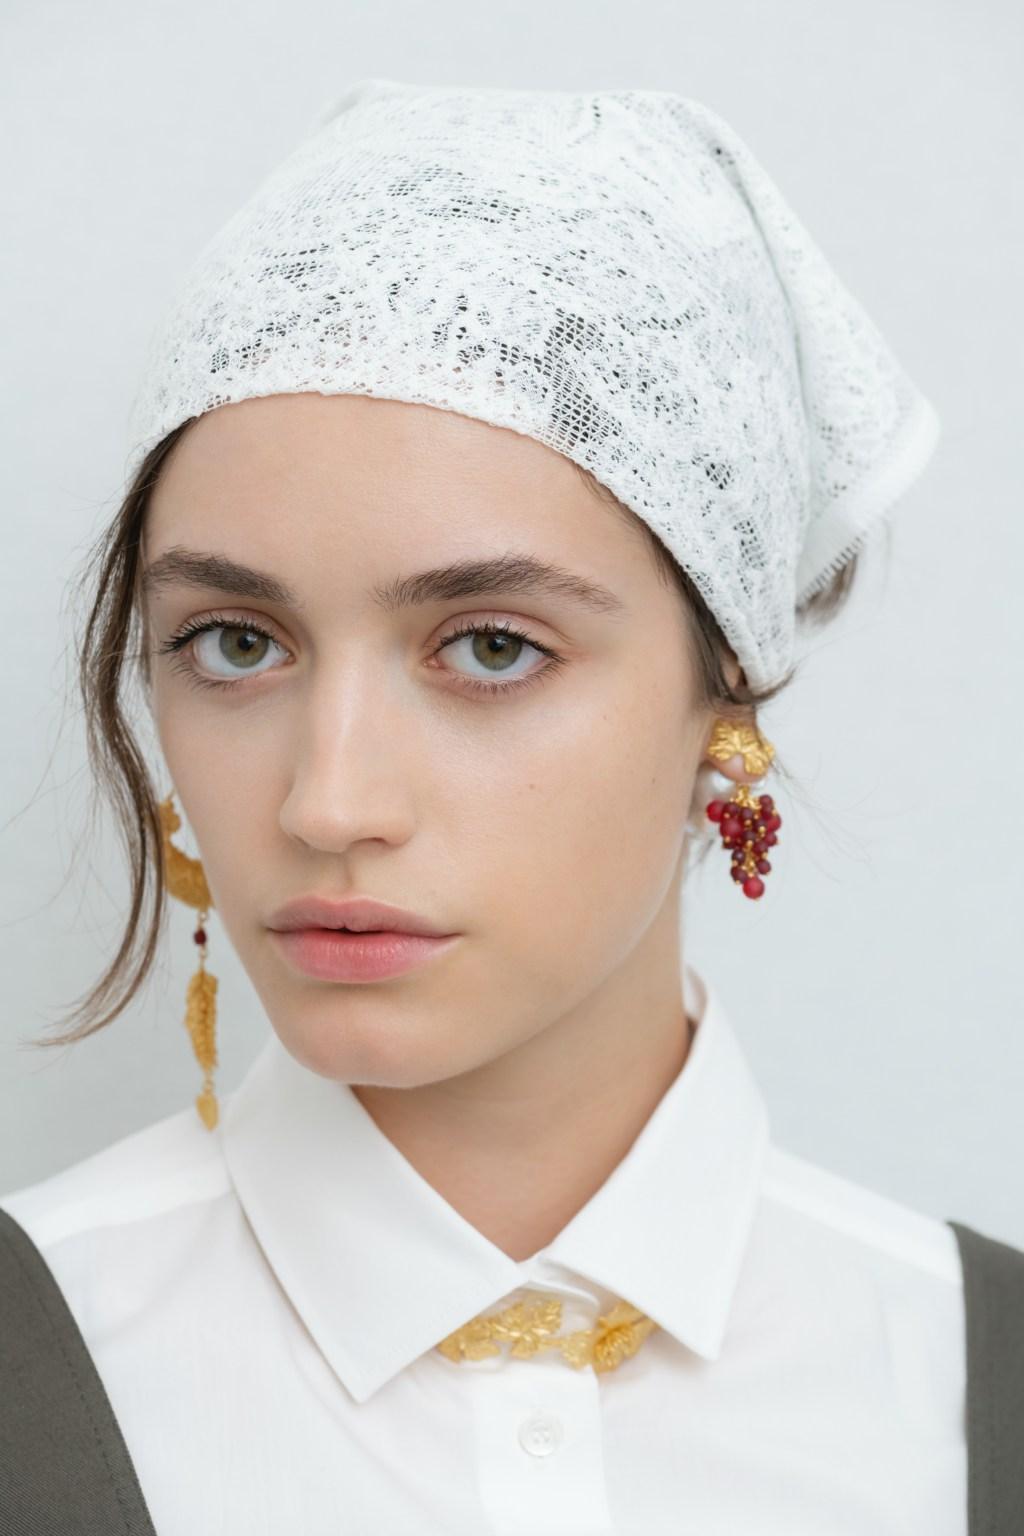 Dior Resort 2021 Beauty